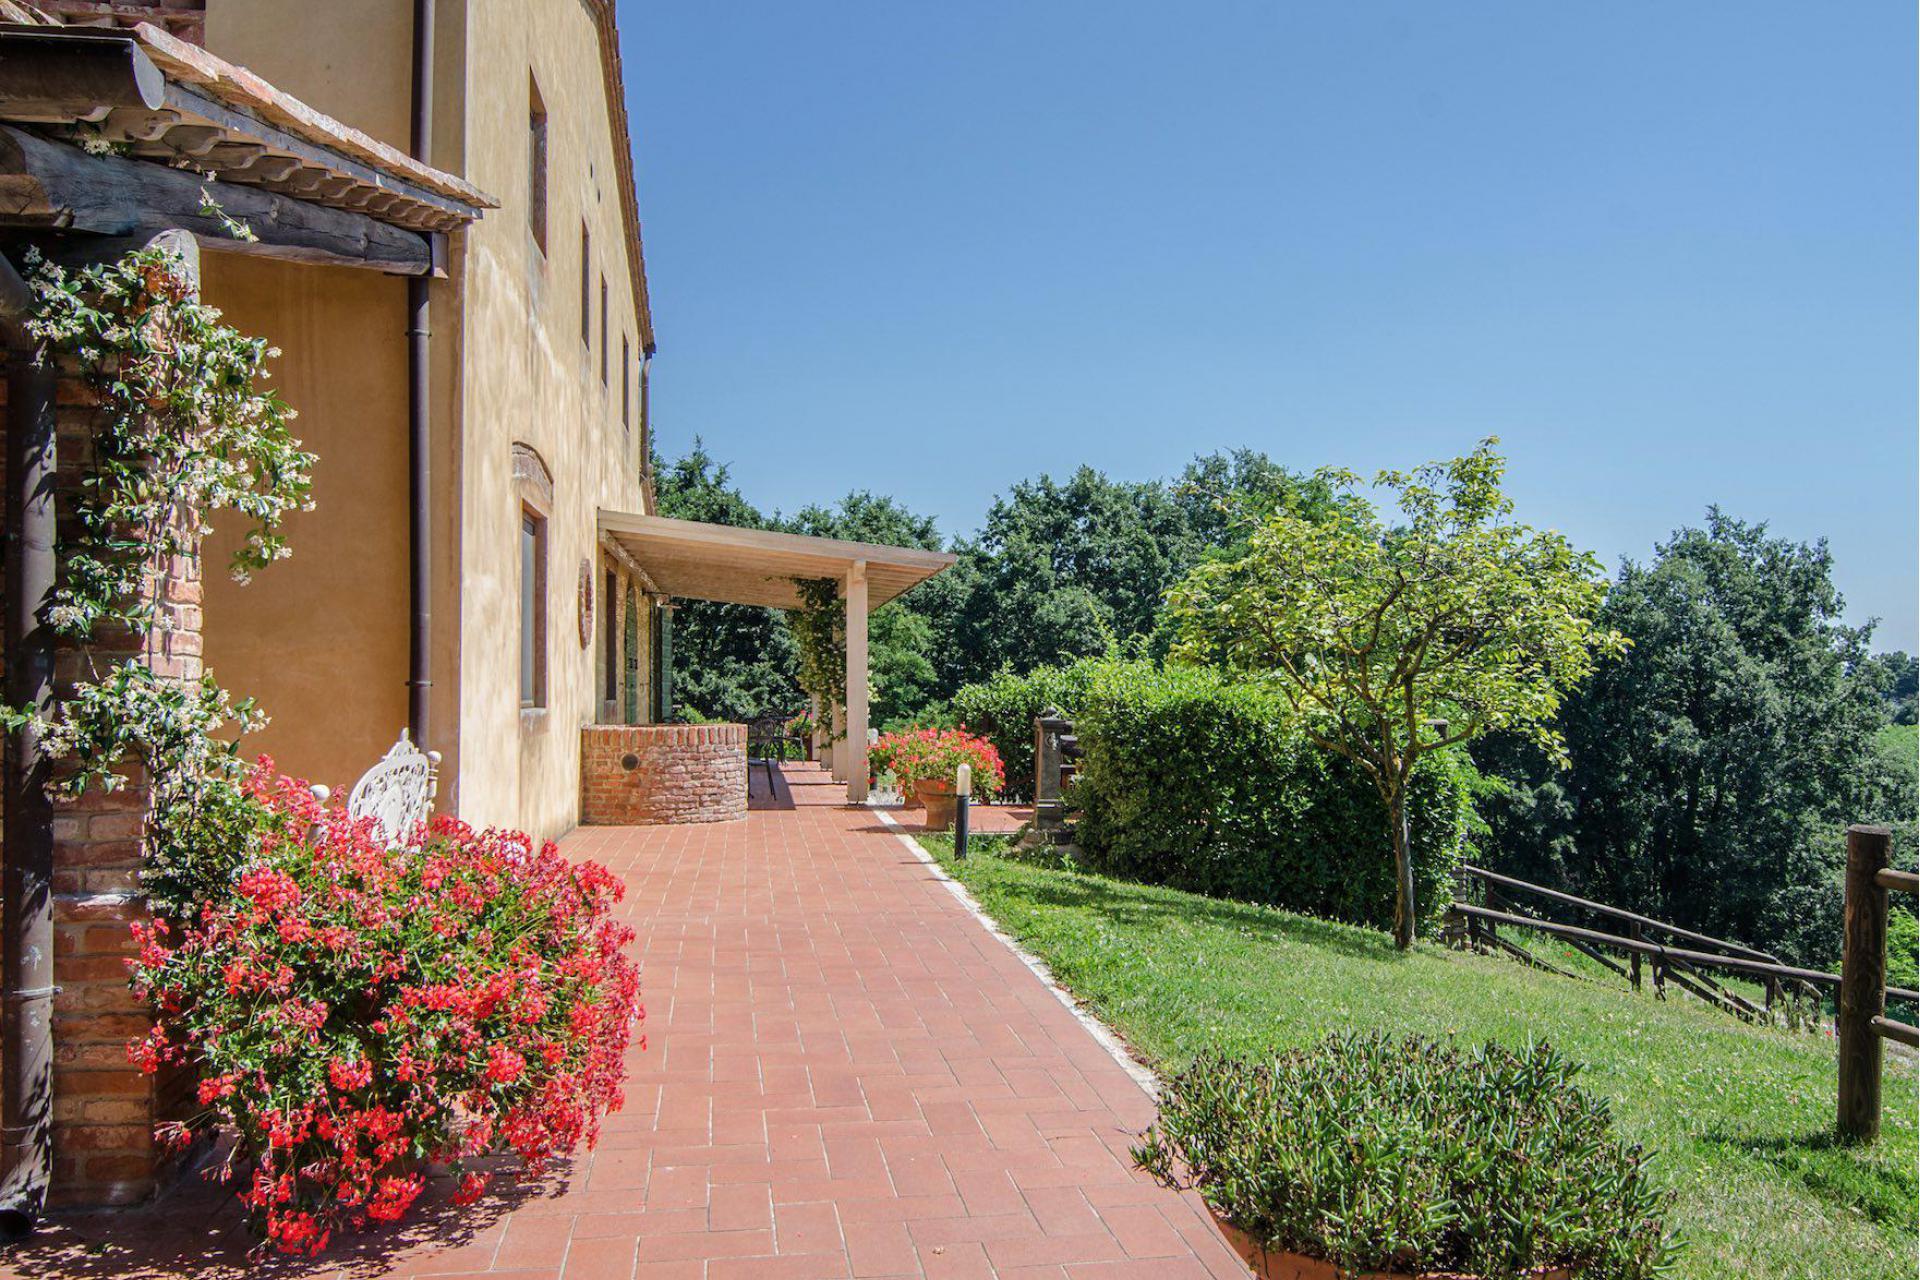 Agriturismo Toscana Lussuoso agriturismo vicino San Gimignano, in Toscana